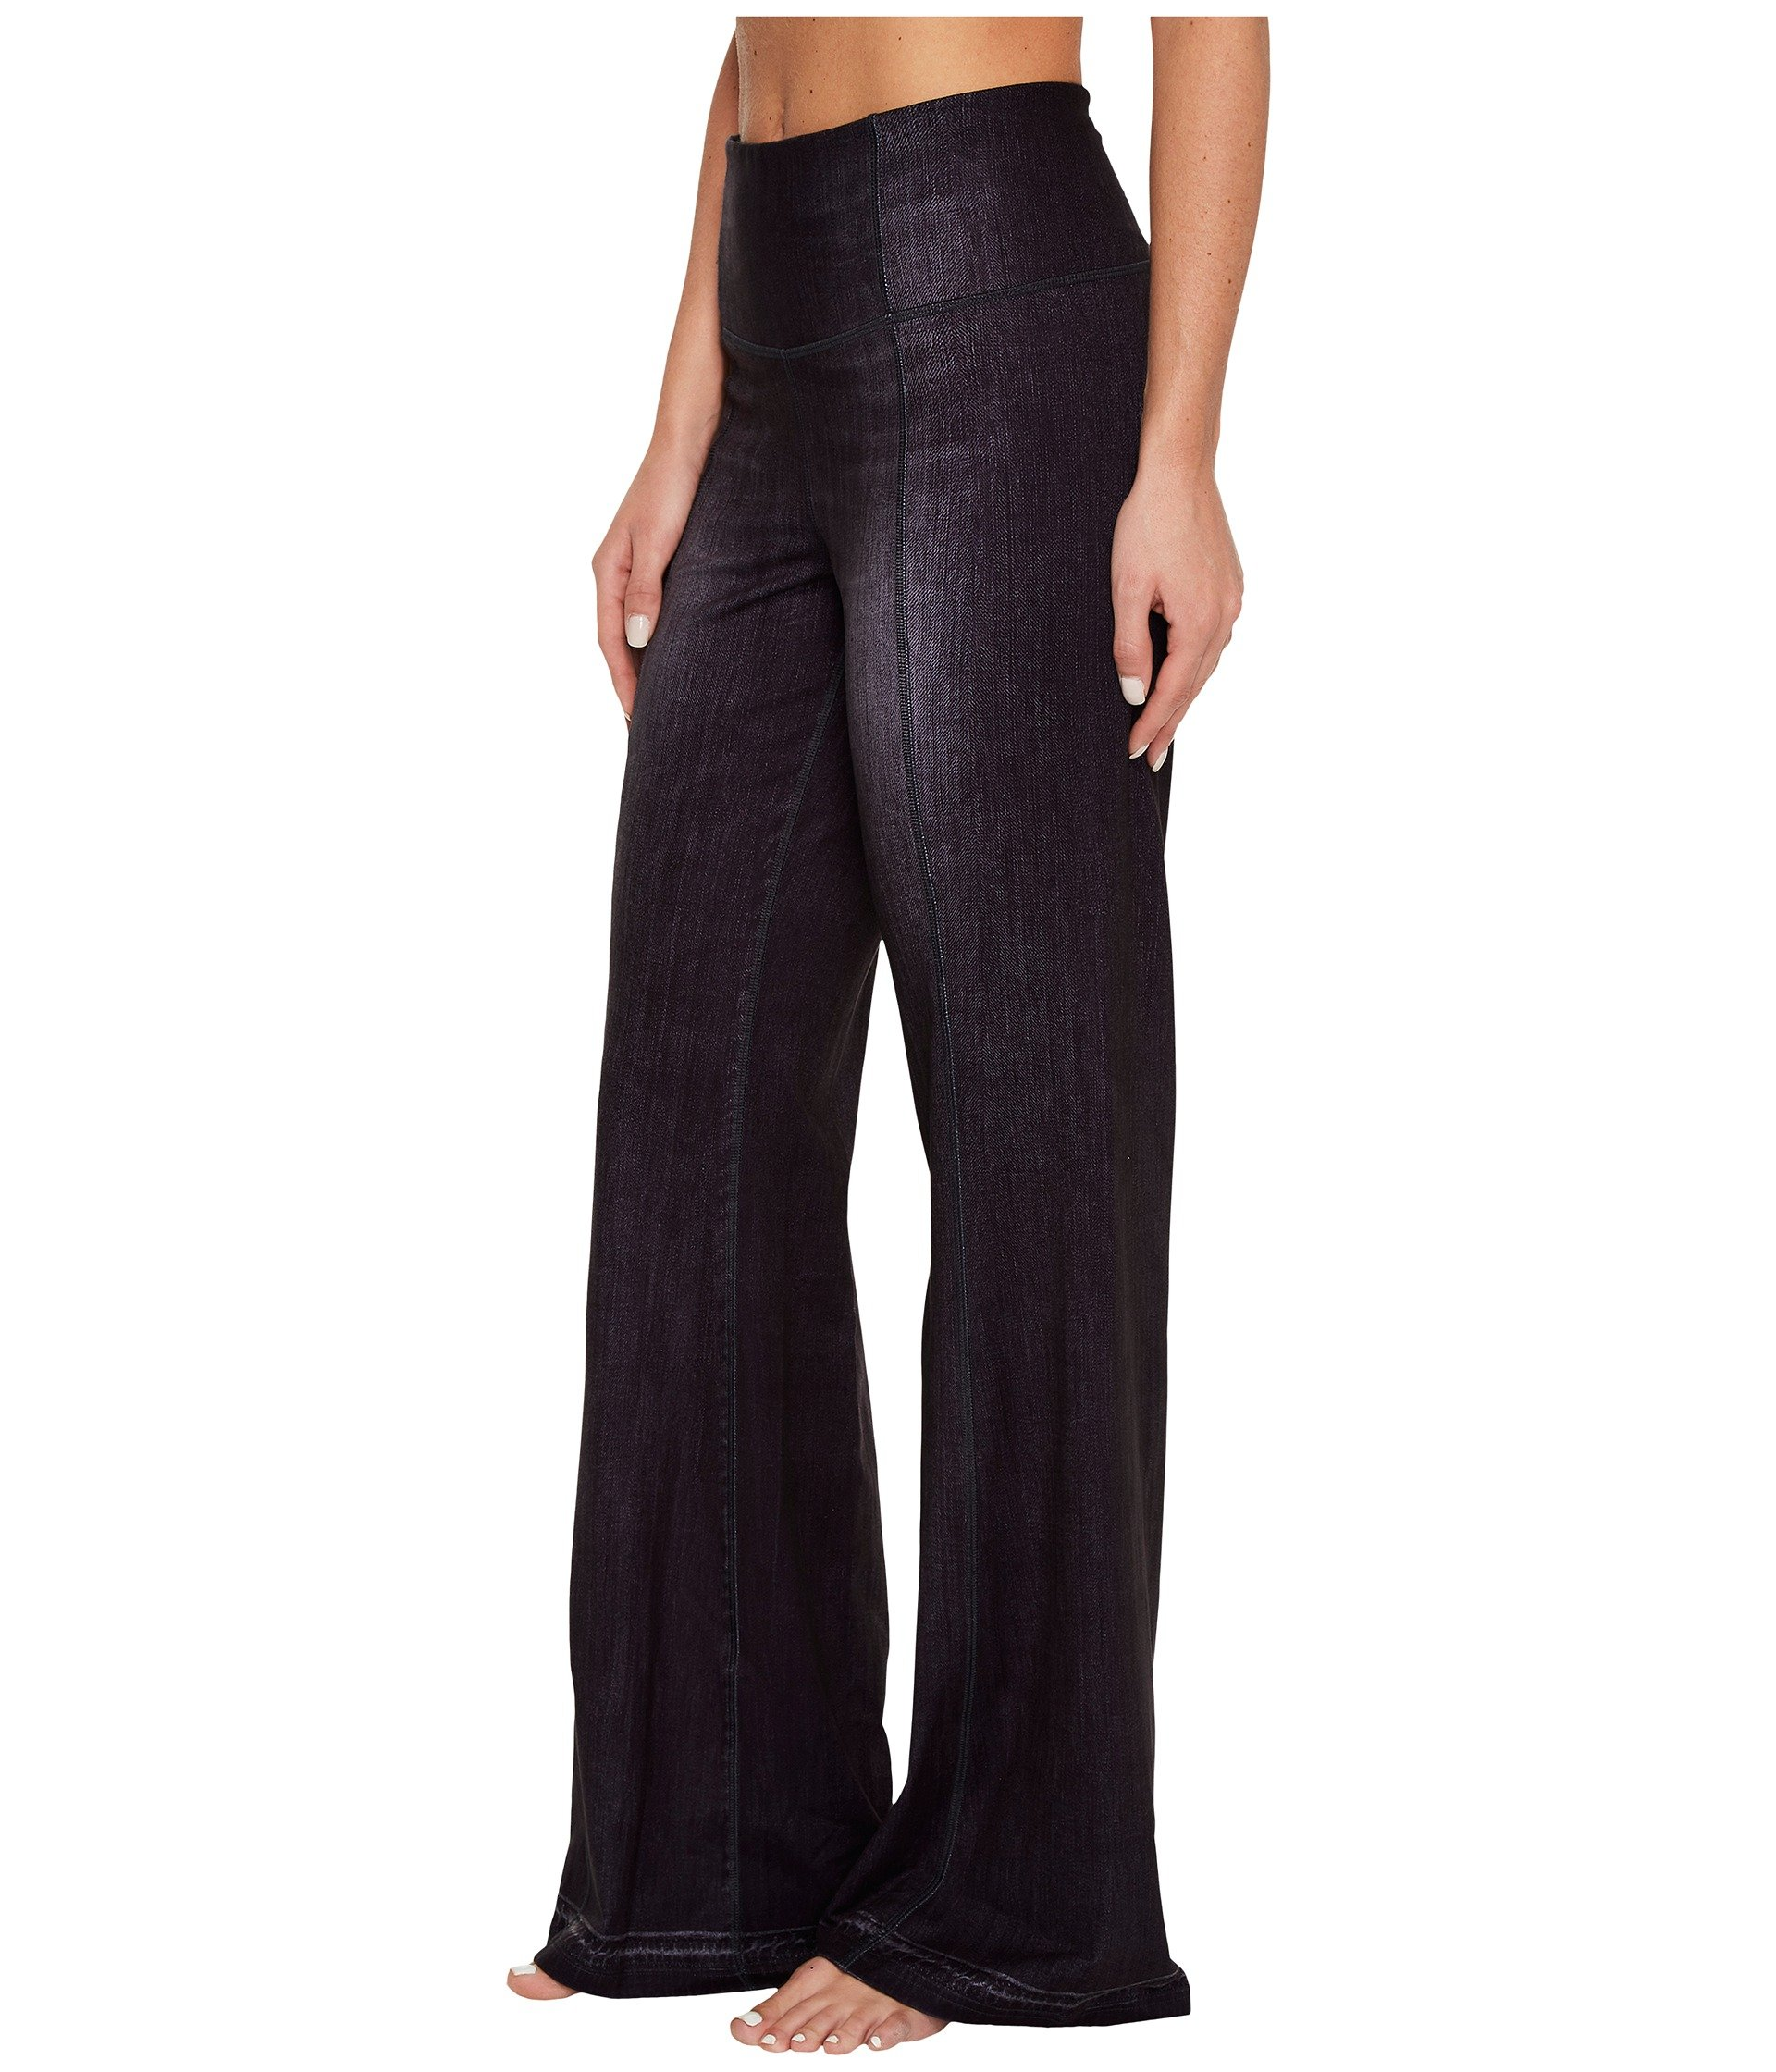 Lucy Women's Indigo Flare Pants Black Indigo Pants by Lucy (Image #3)